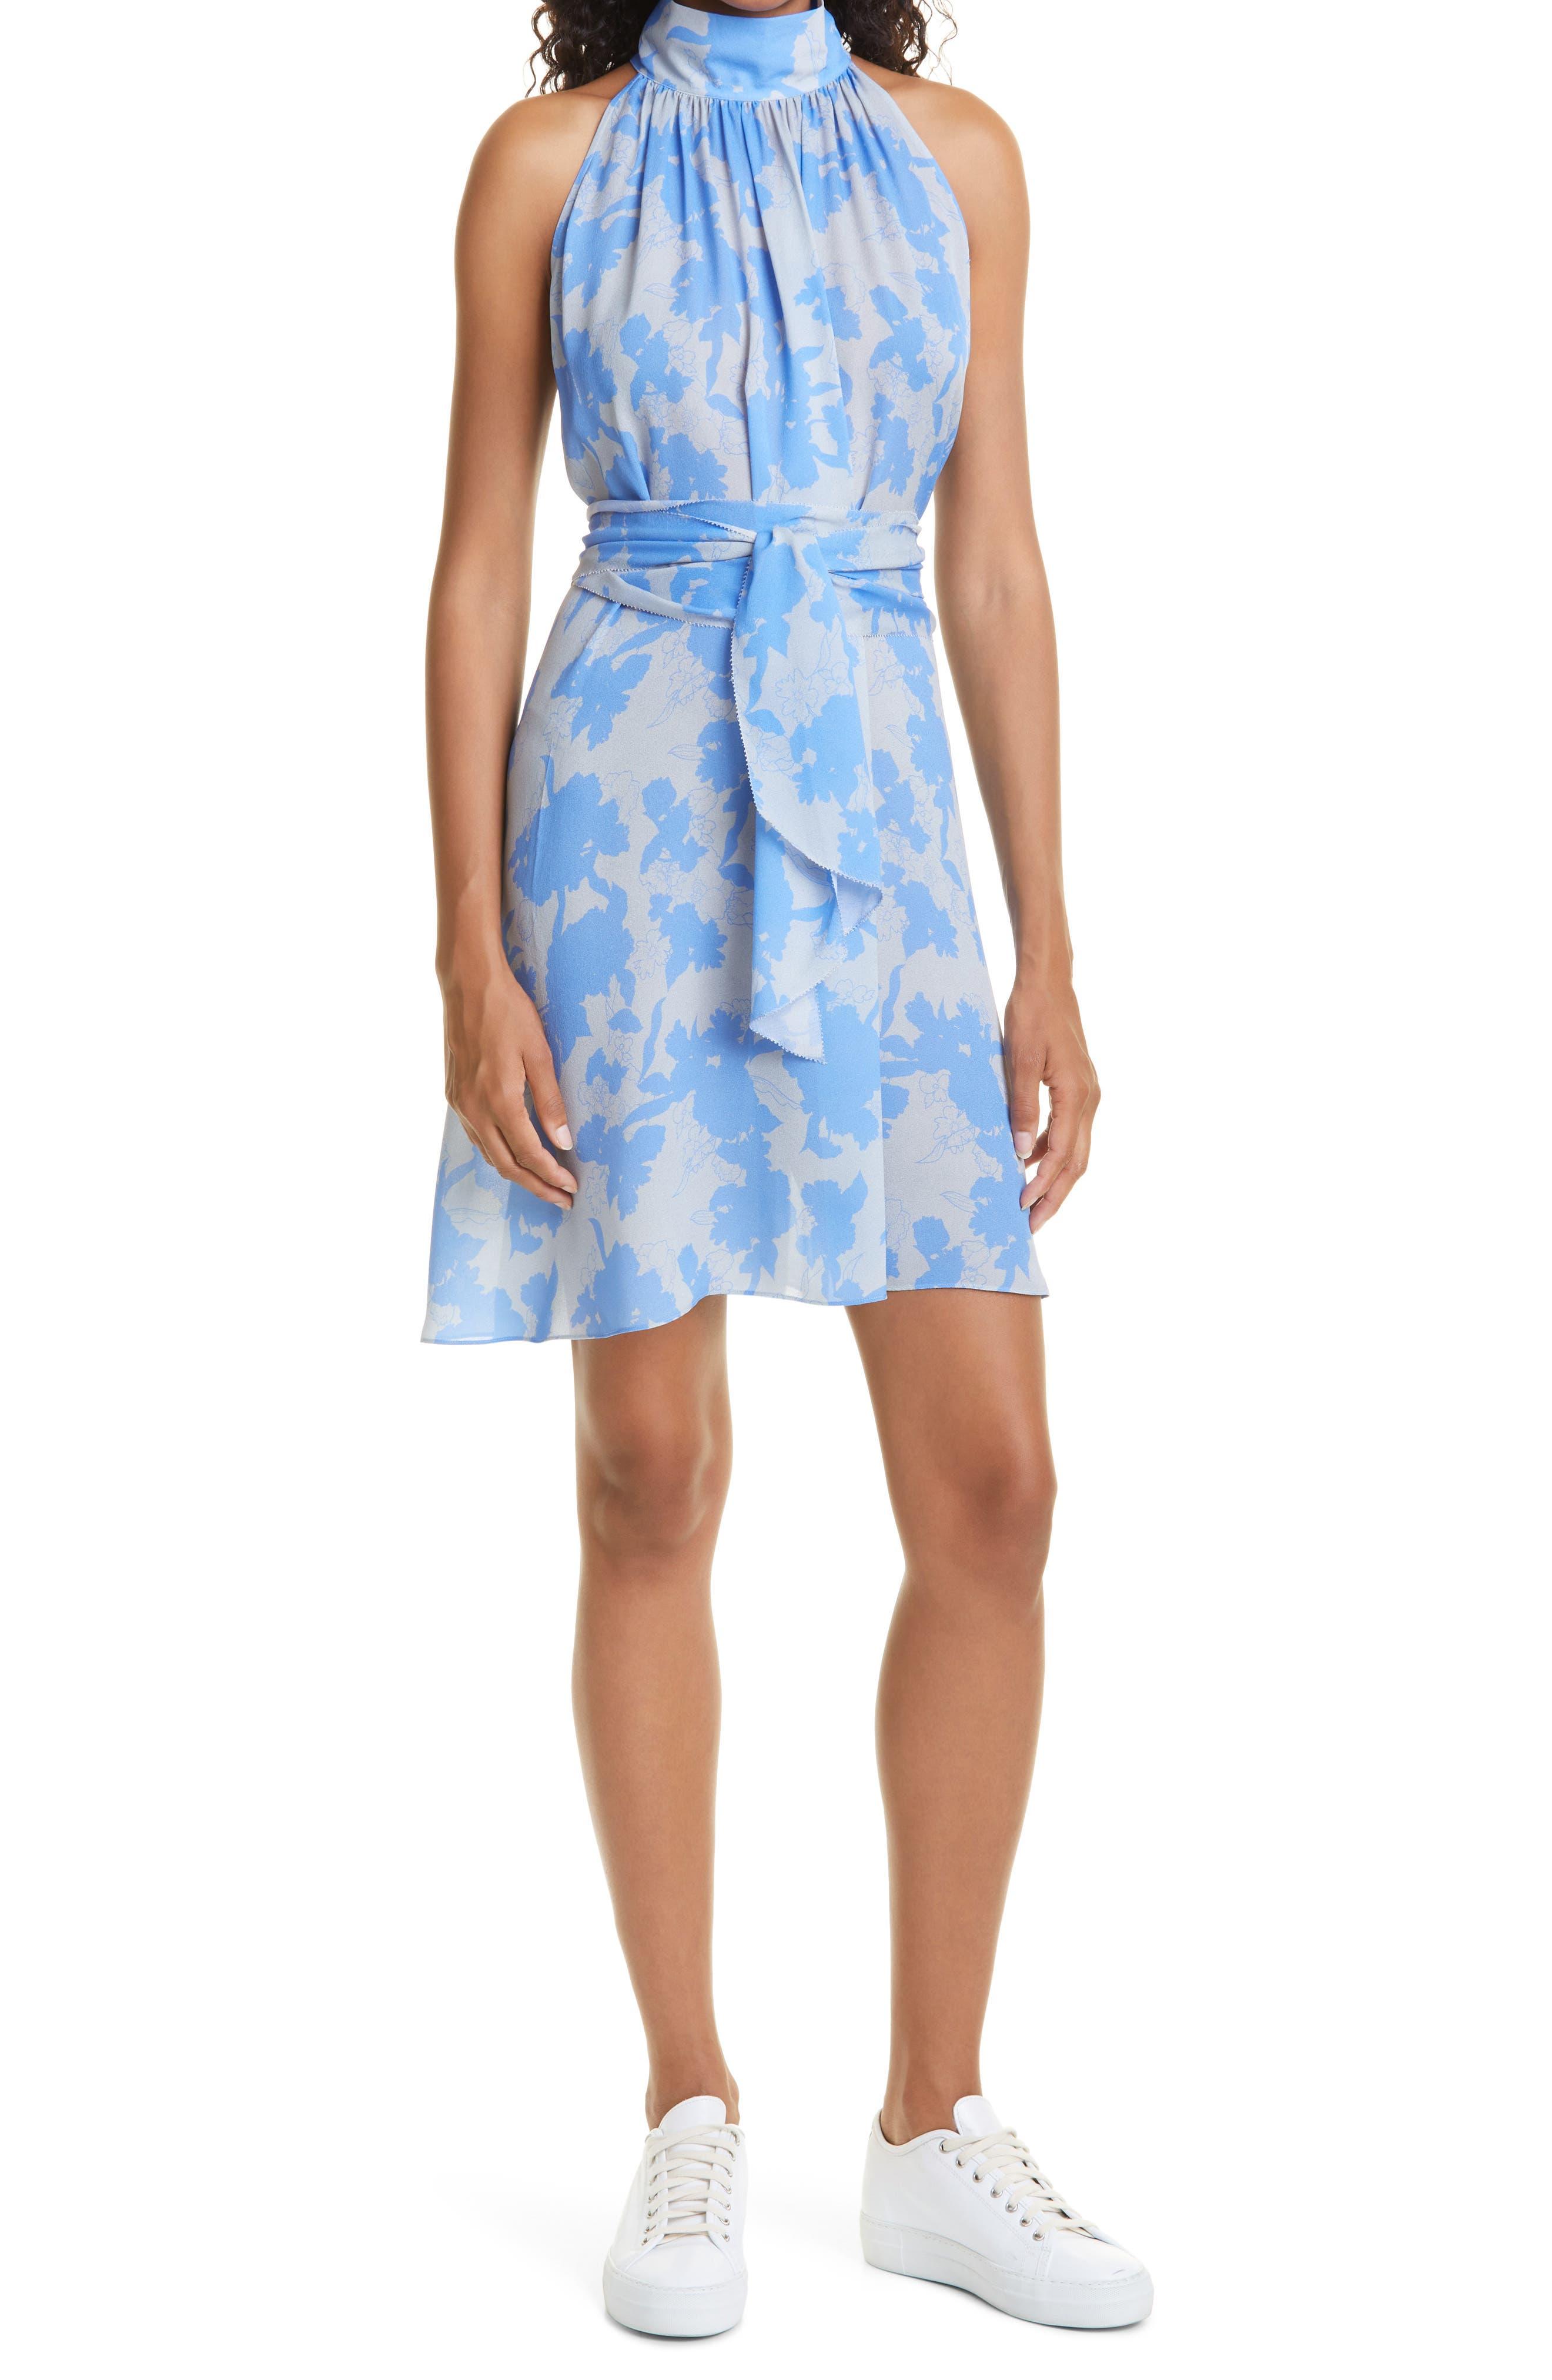 Lucia Floral Print Sleeveless Dress